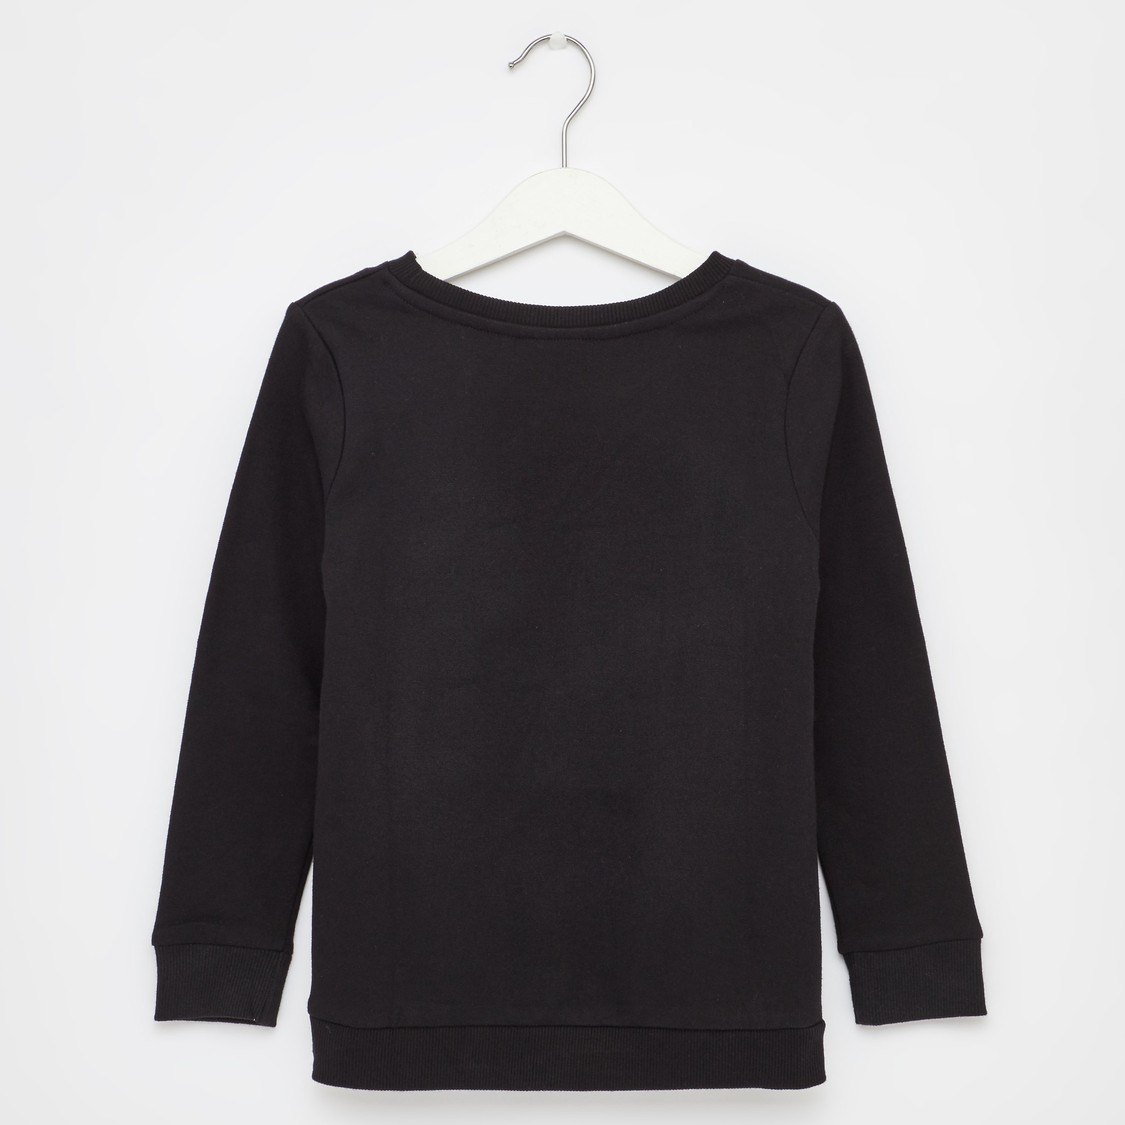 Paris Print Round Neck Sweatshirt with Long Sleeves